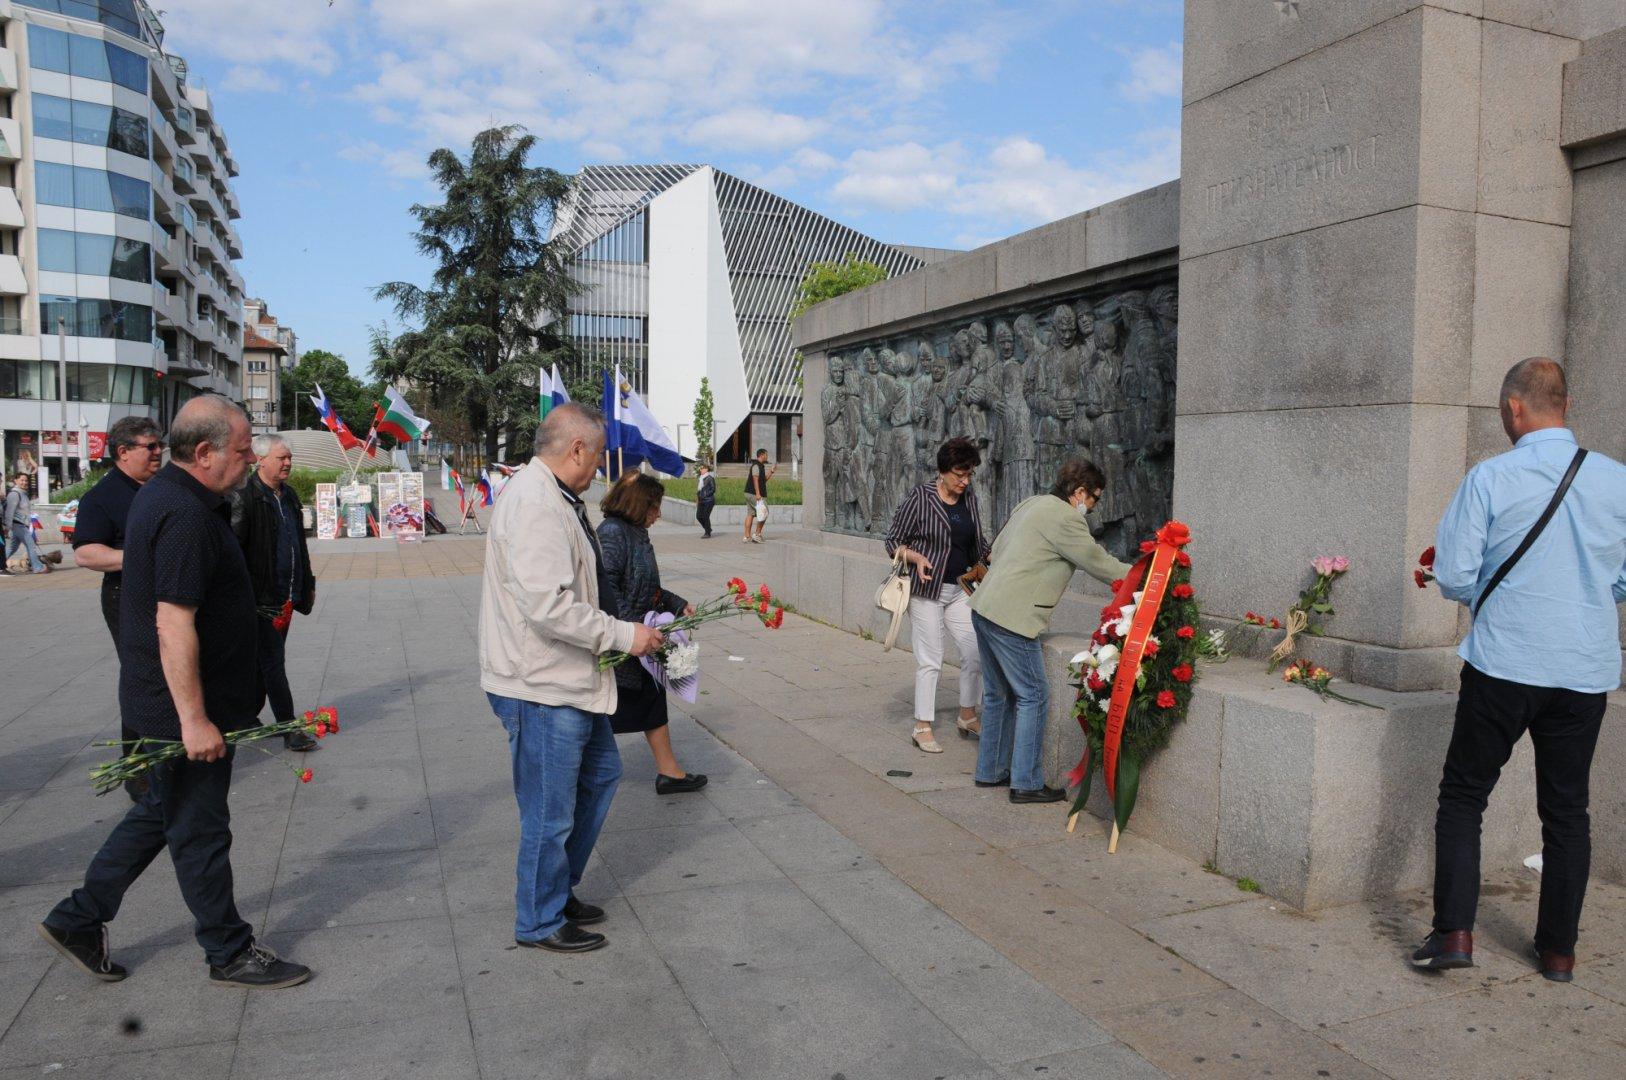 Ръководство и членове на БСП поднесоха цветя пред паметника Альоша. Снимки БСП - Бургас